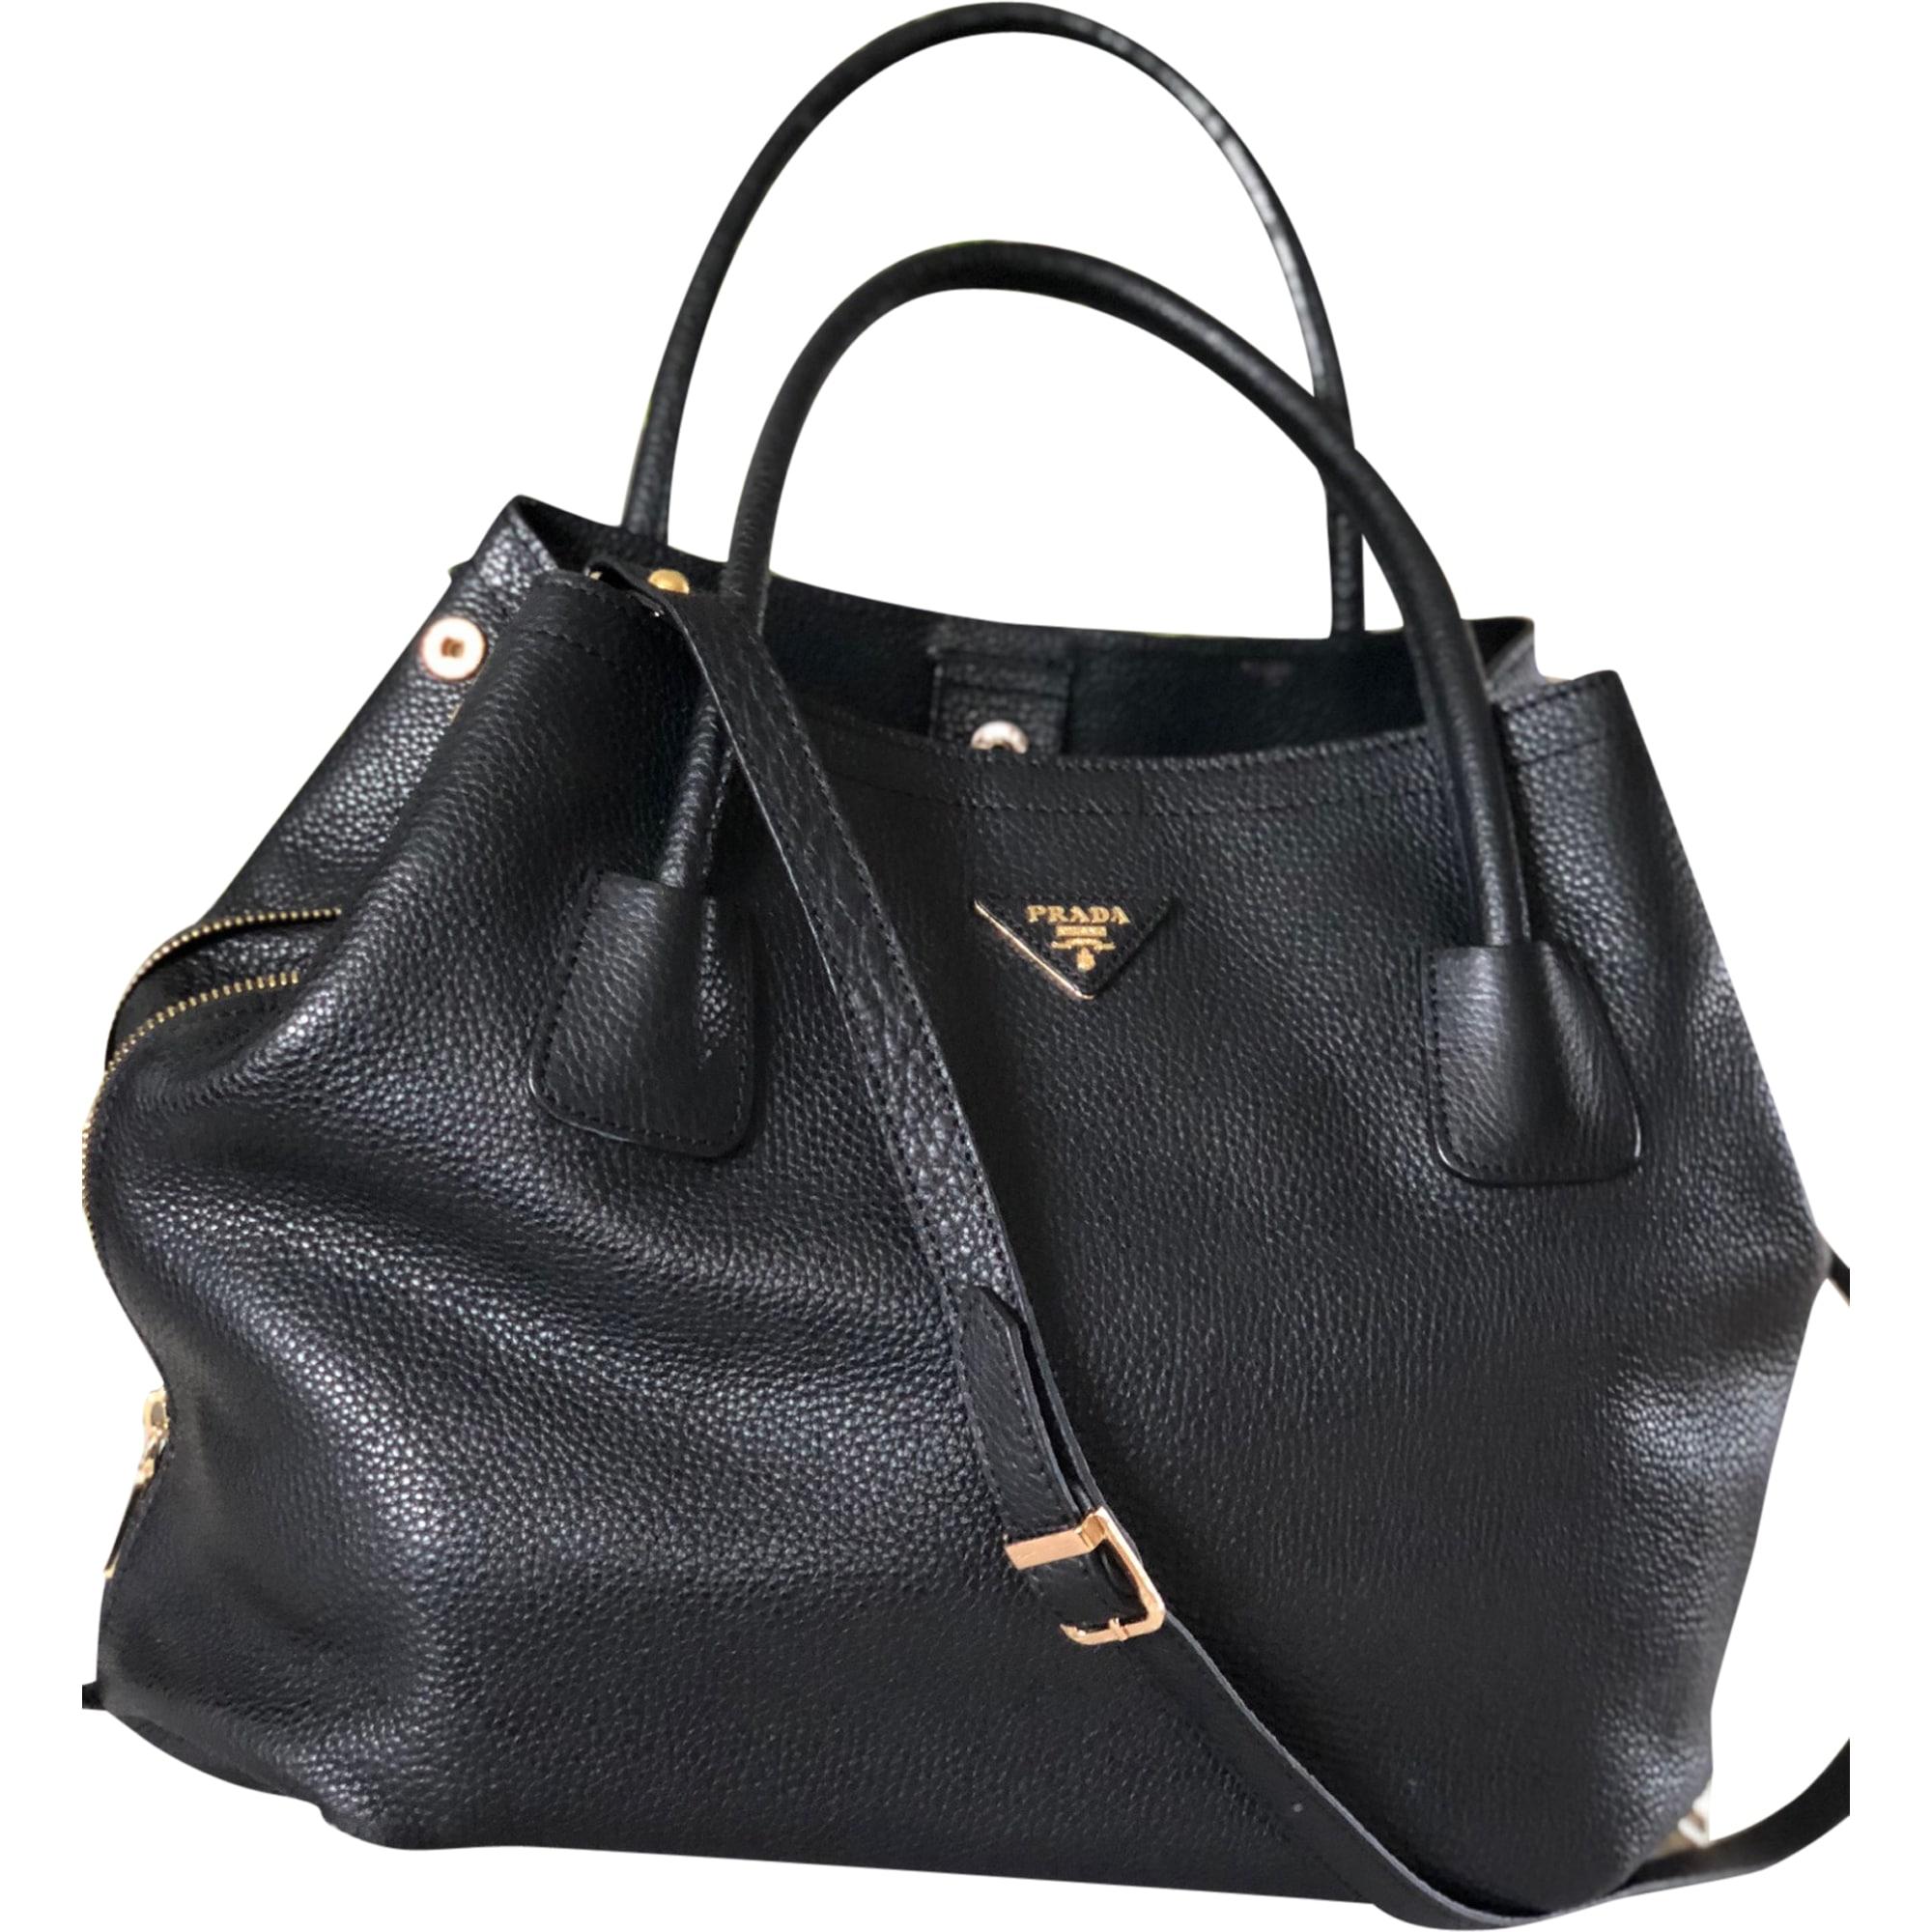 9993dd703aff10 Leather Handbag PRADA black vendu par Marmousez - 7779832